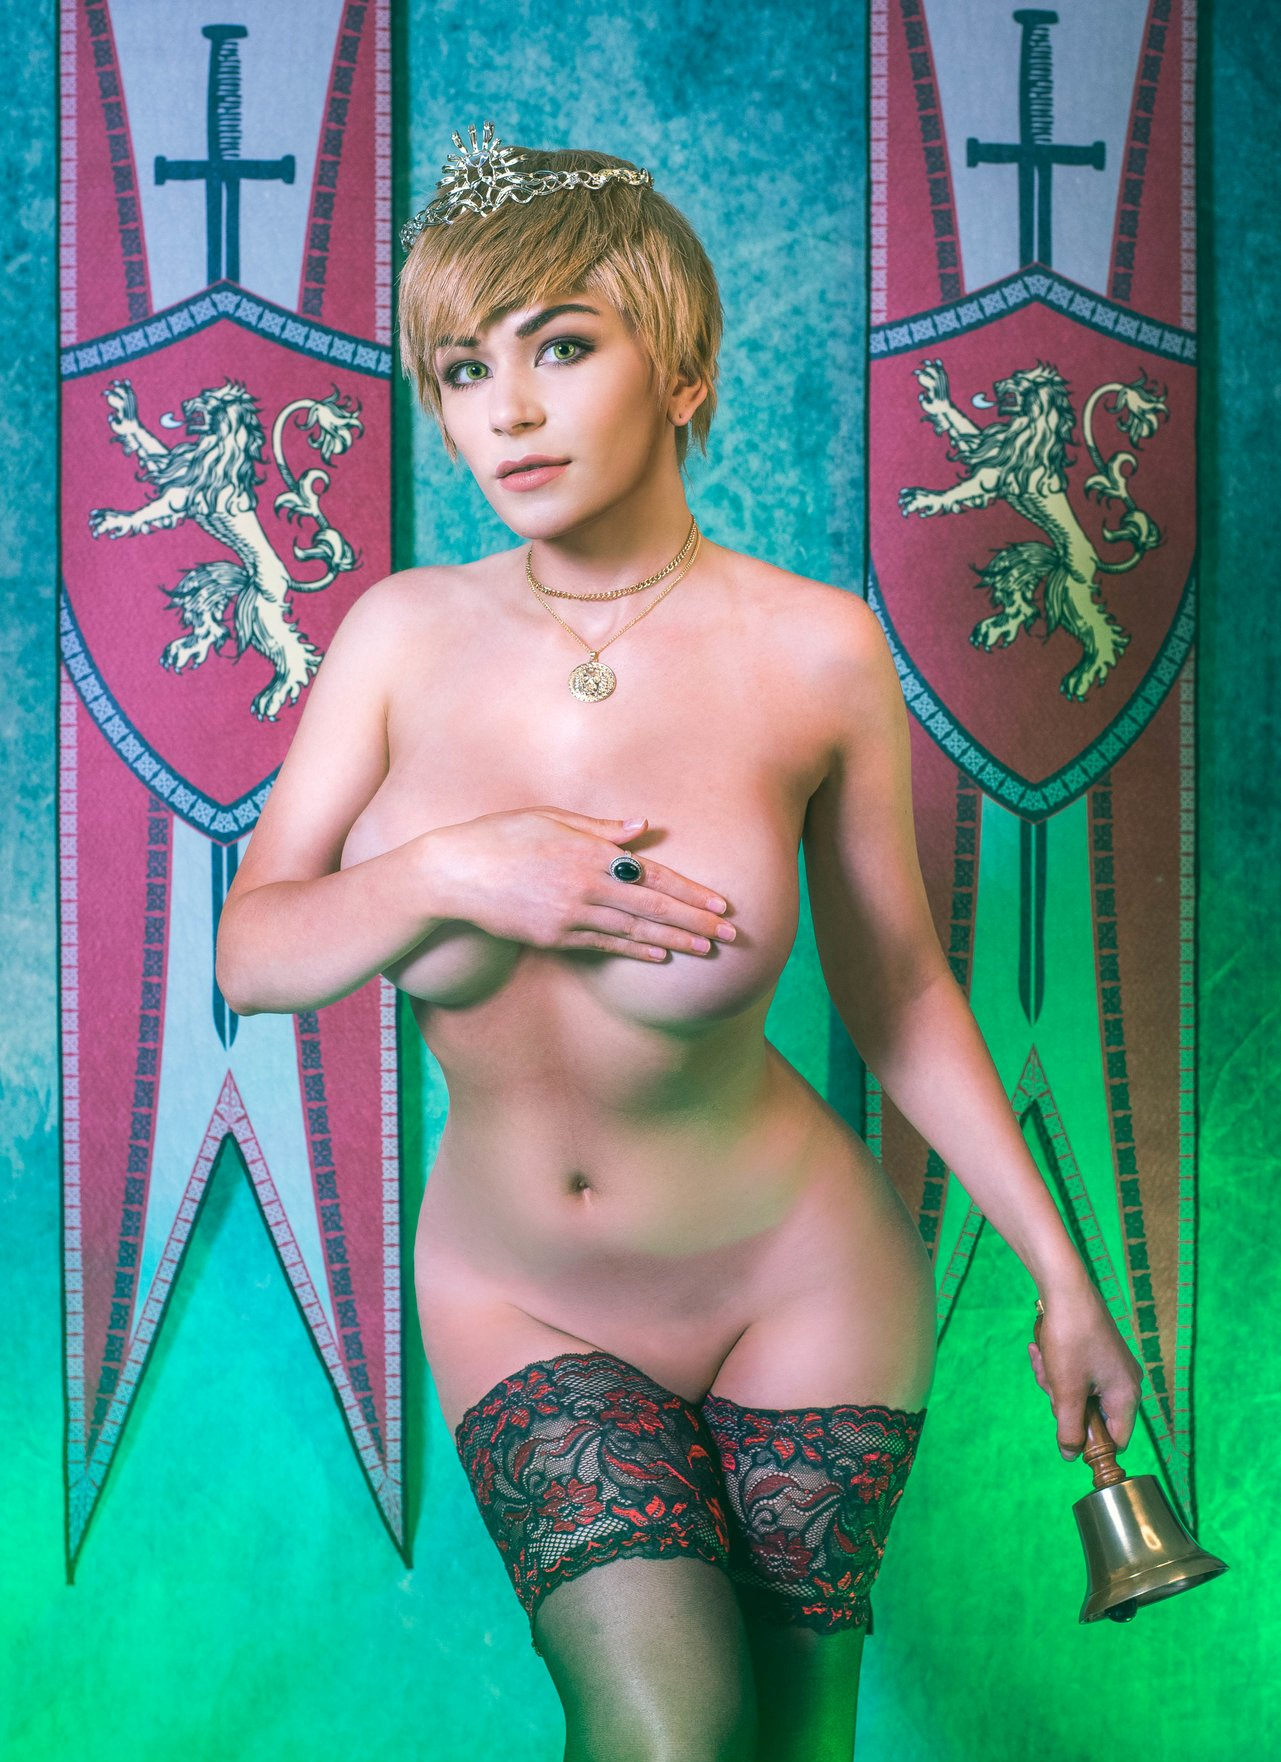 Danielle Beaulieu Daniellecosplay Onlyfans Nude Leaks 0023